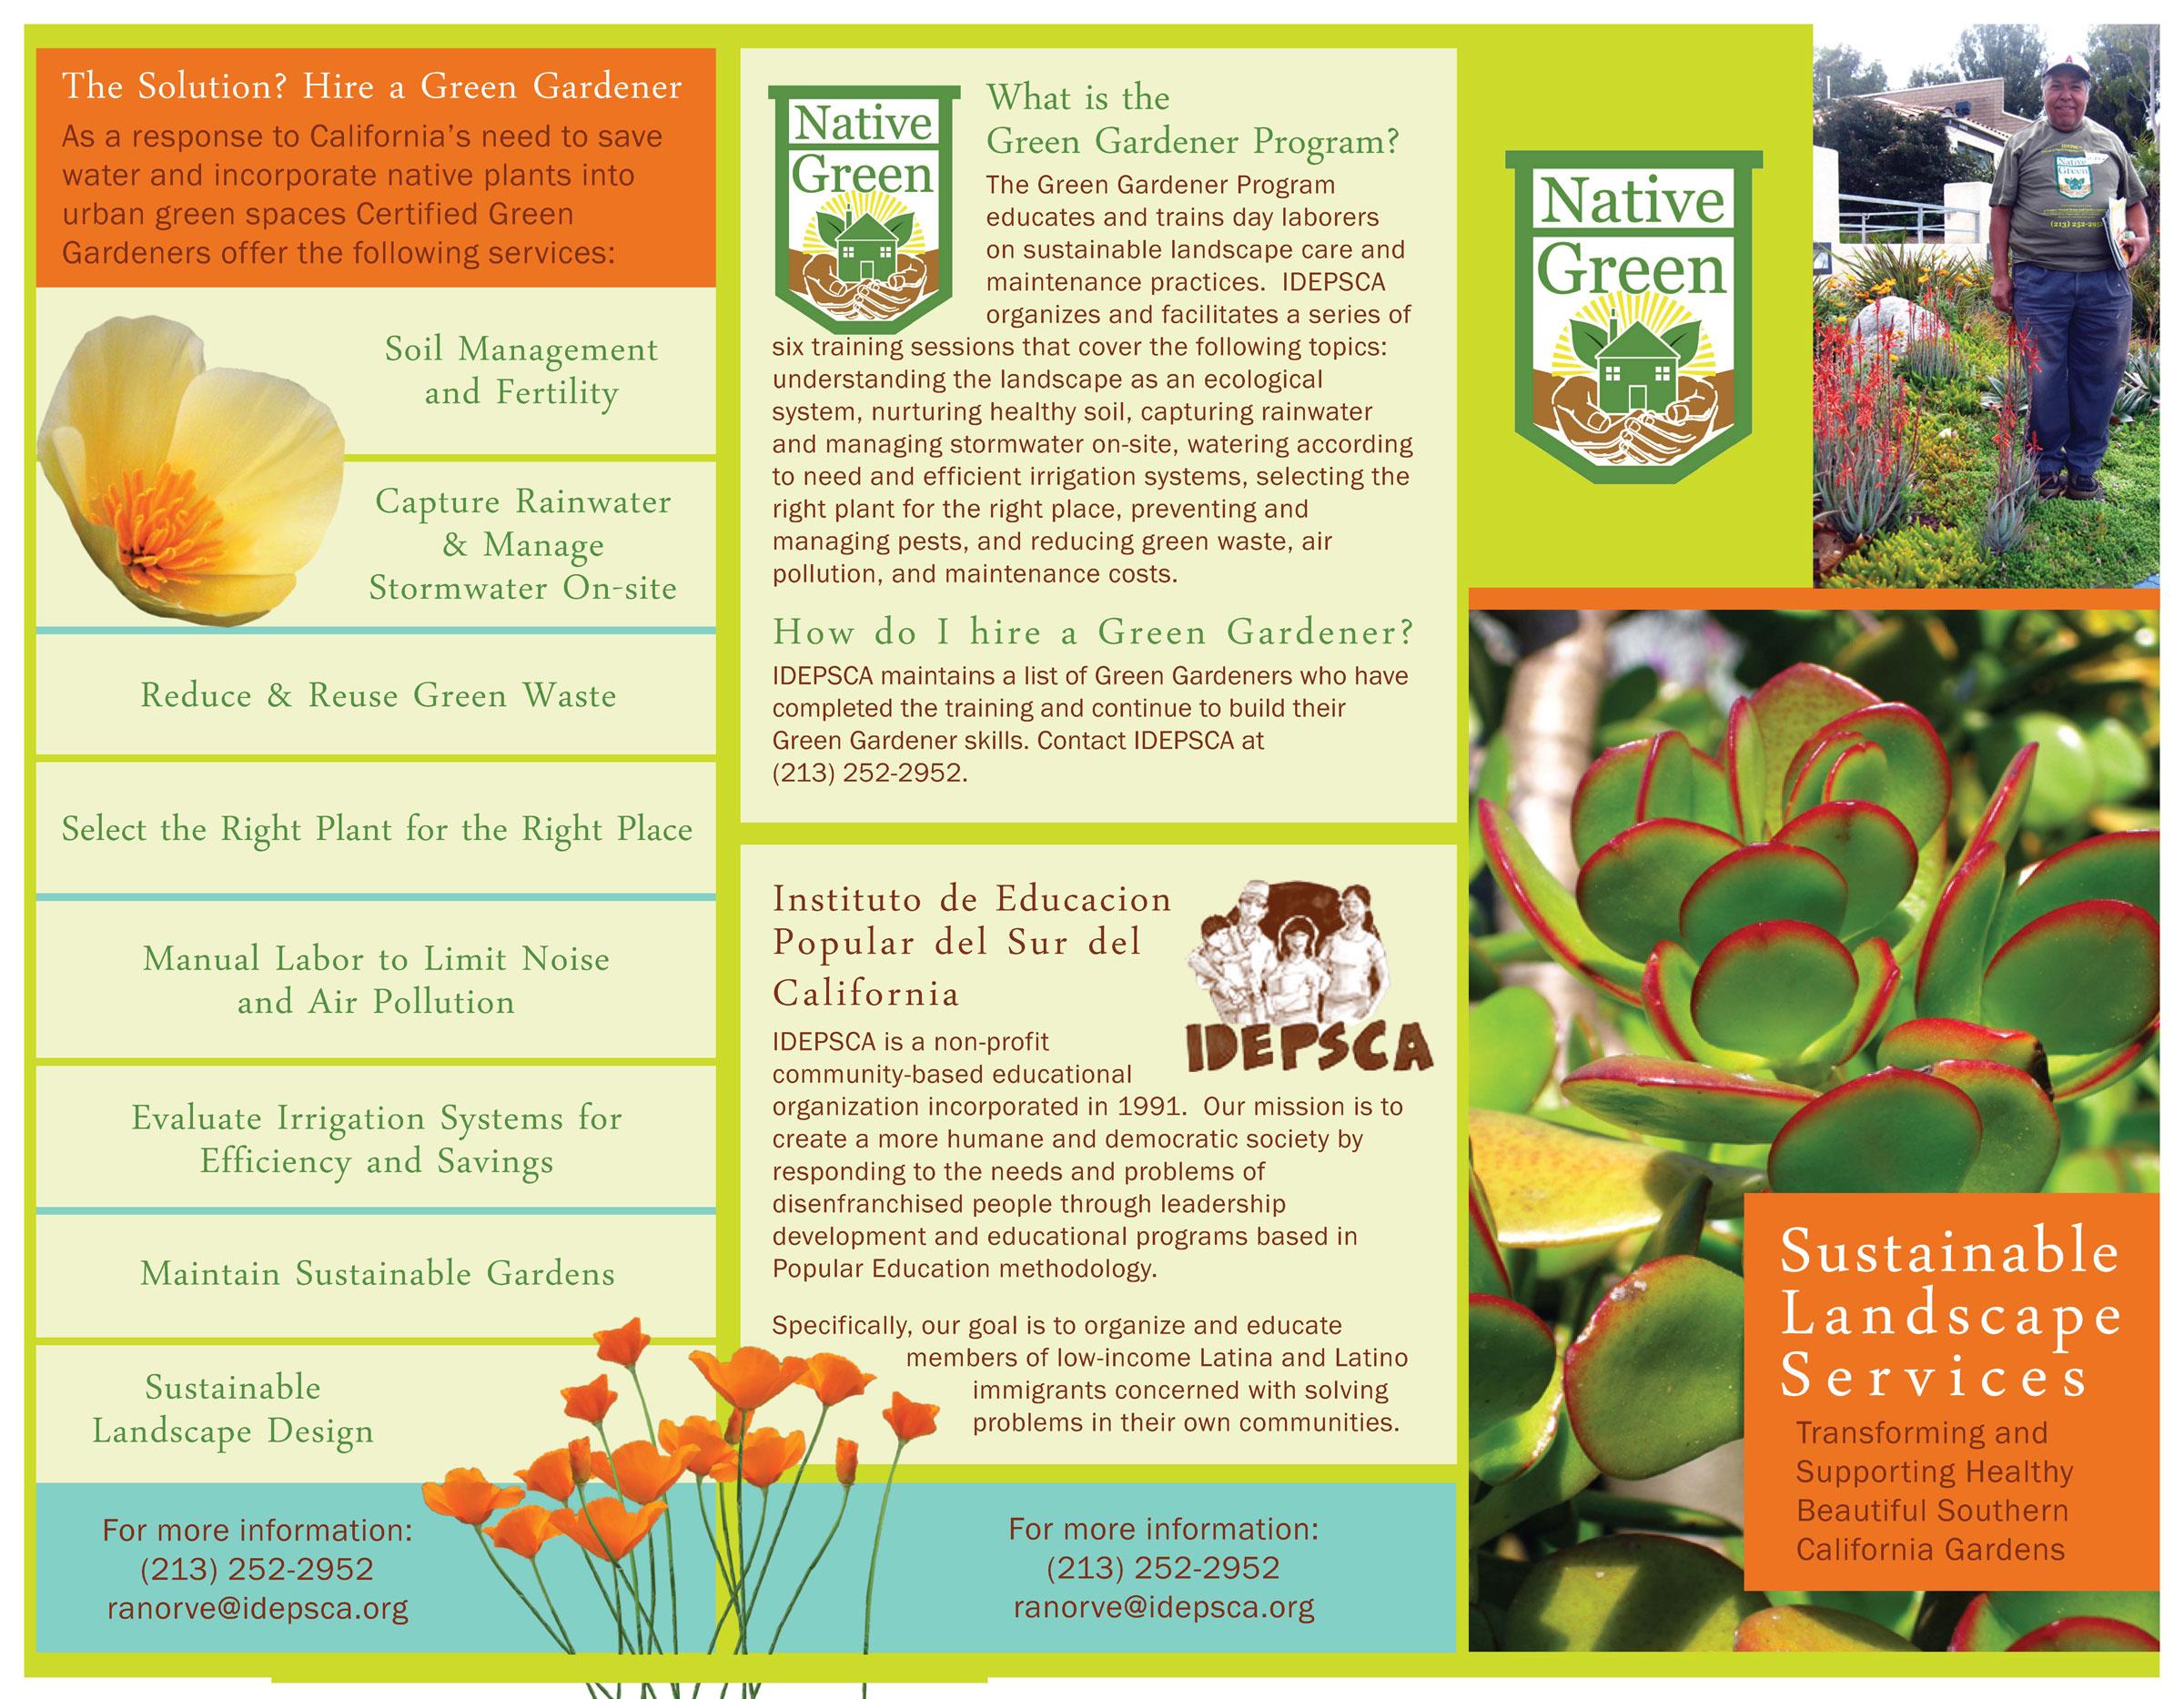 NativeGreenBrochureForWebJpg   Design  Brochures